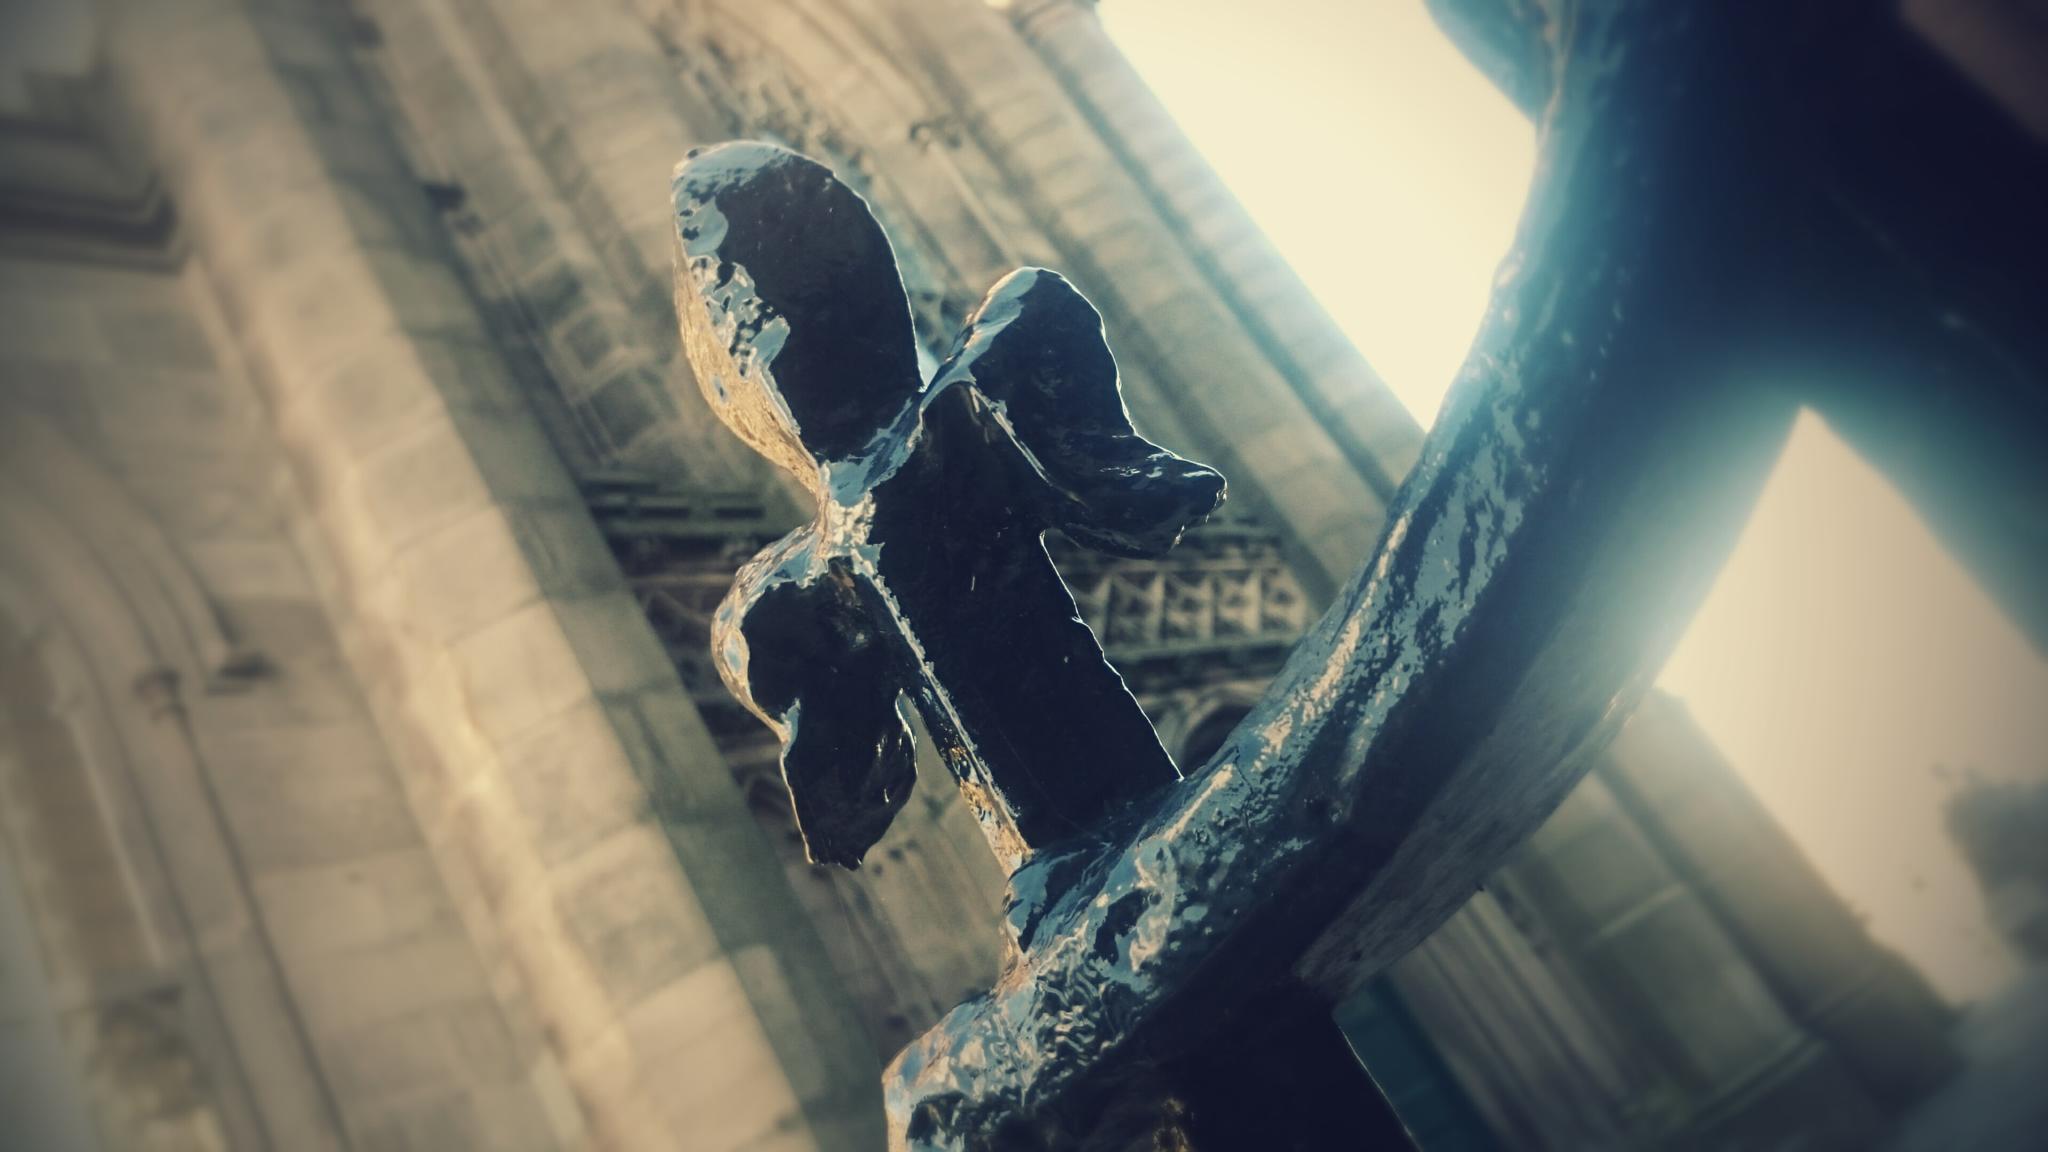 Iron railings.  by ralphadam85